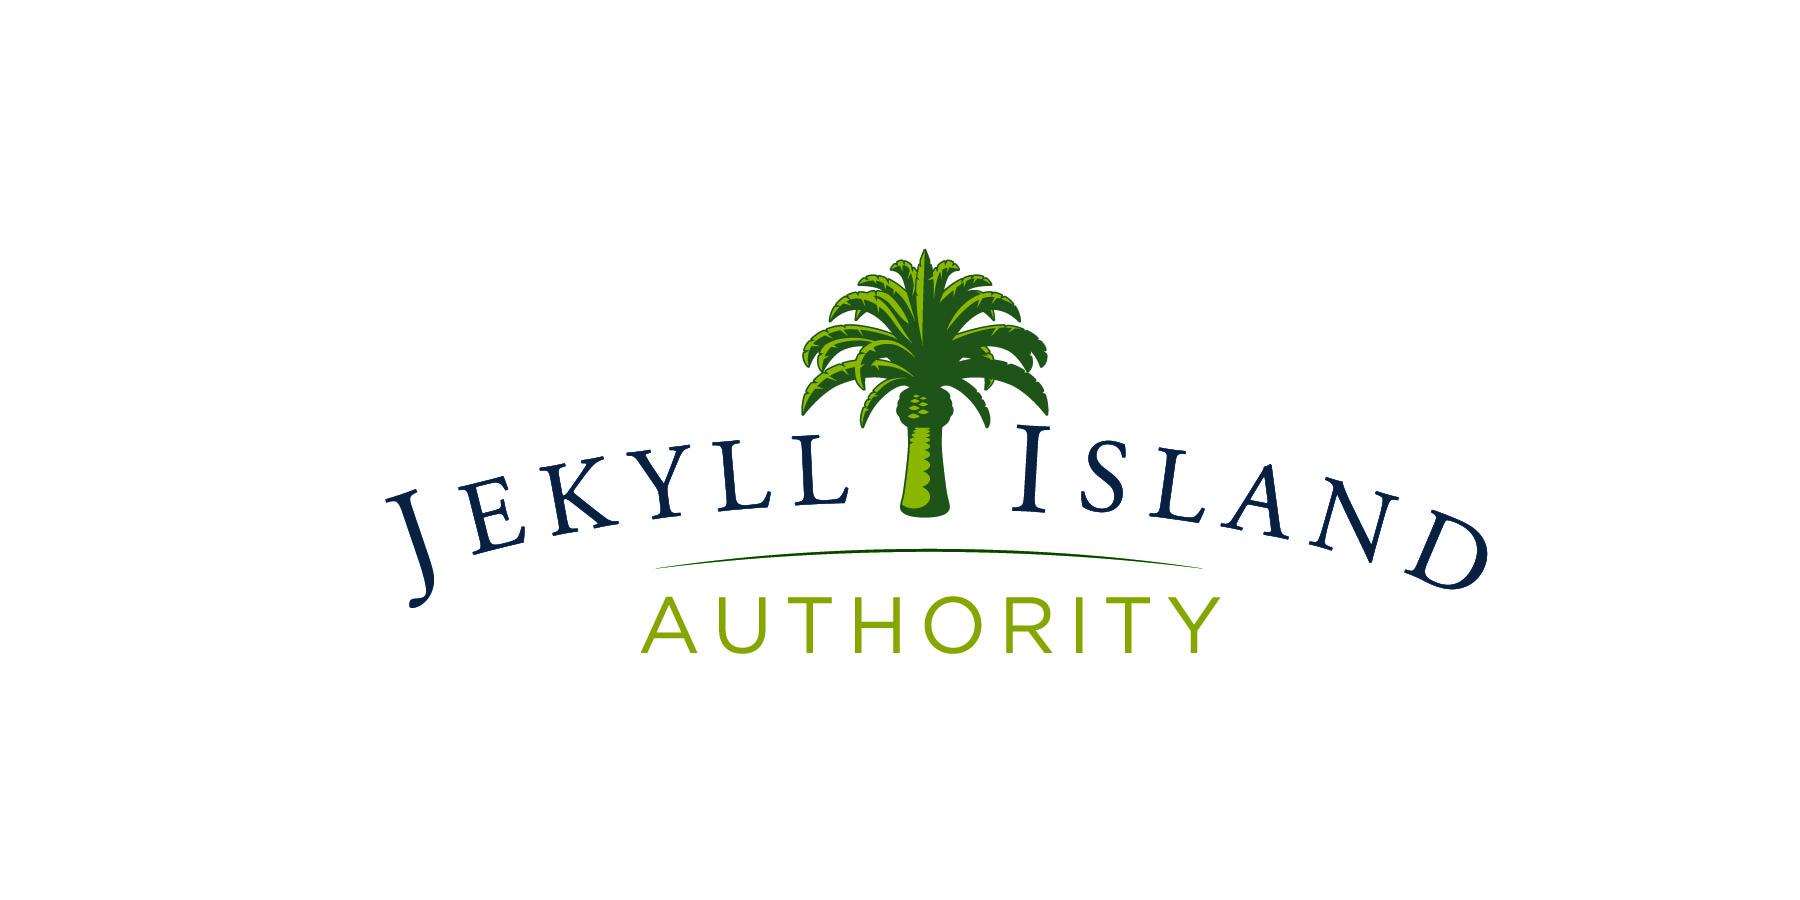 Jekyll Island Authority board minutes